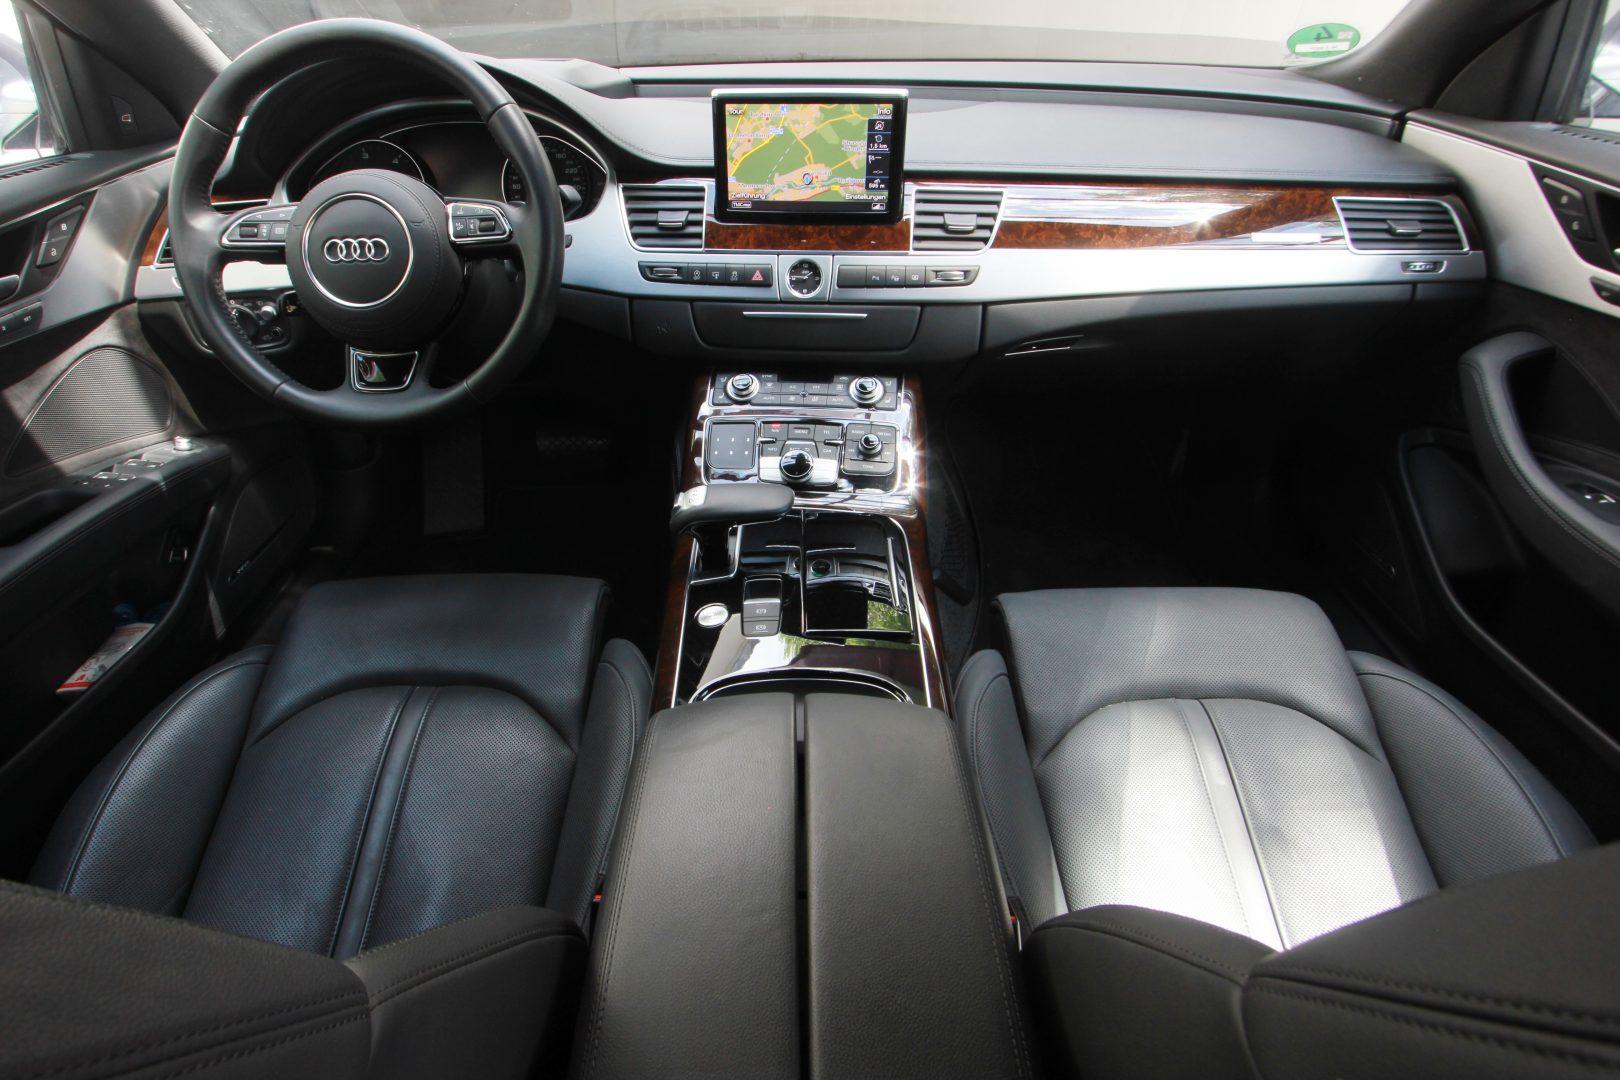 AIL Audi A8 3.0 TDI DAB Bose  6